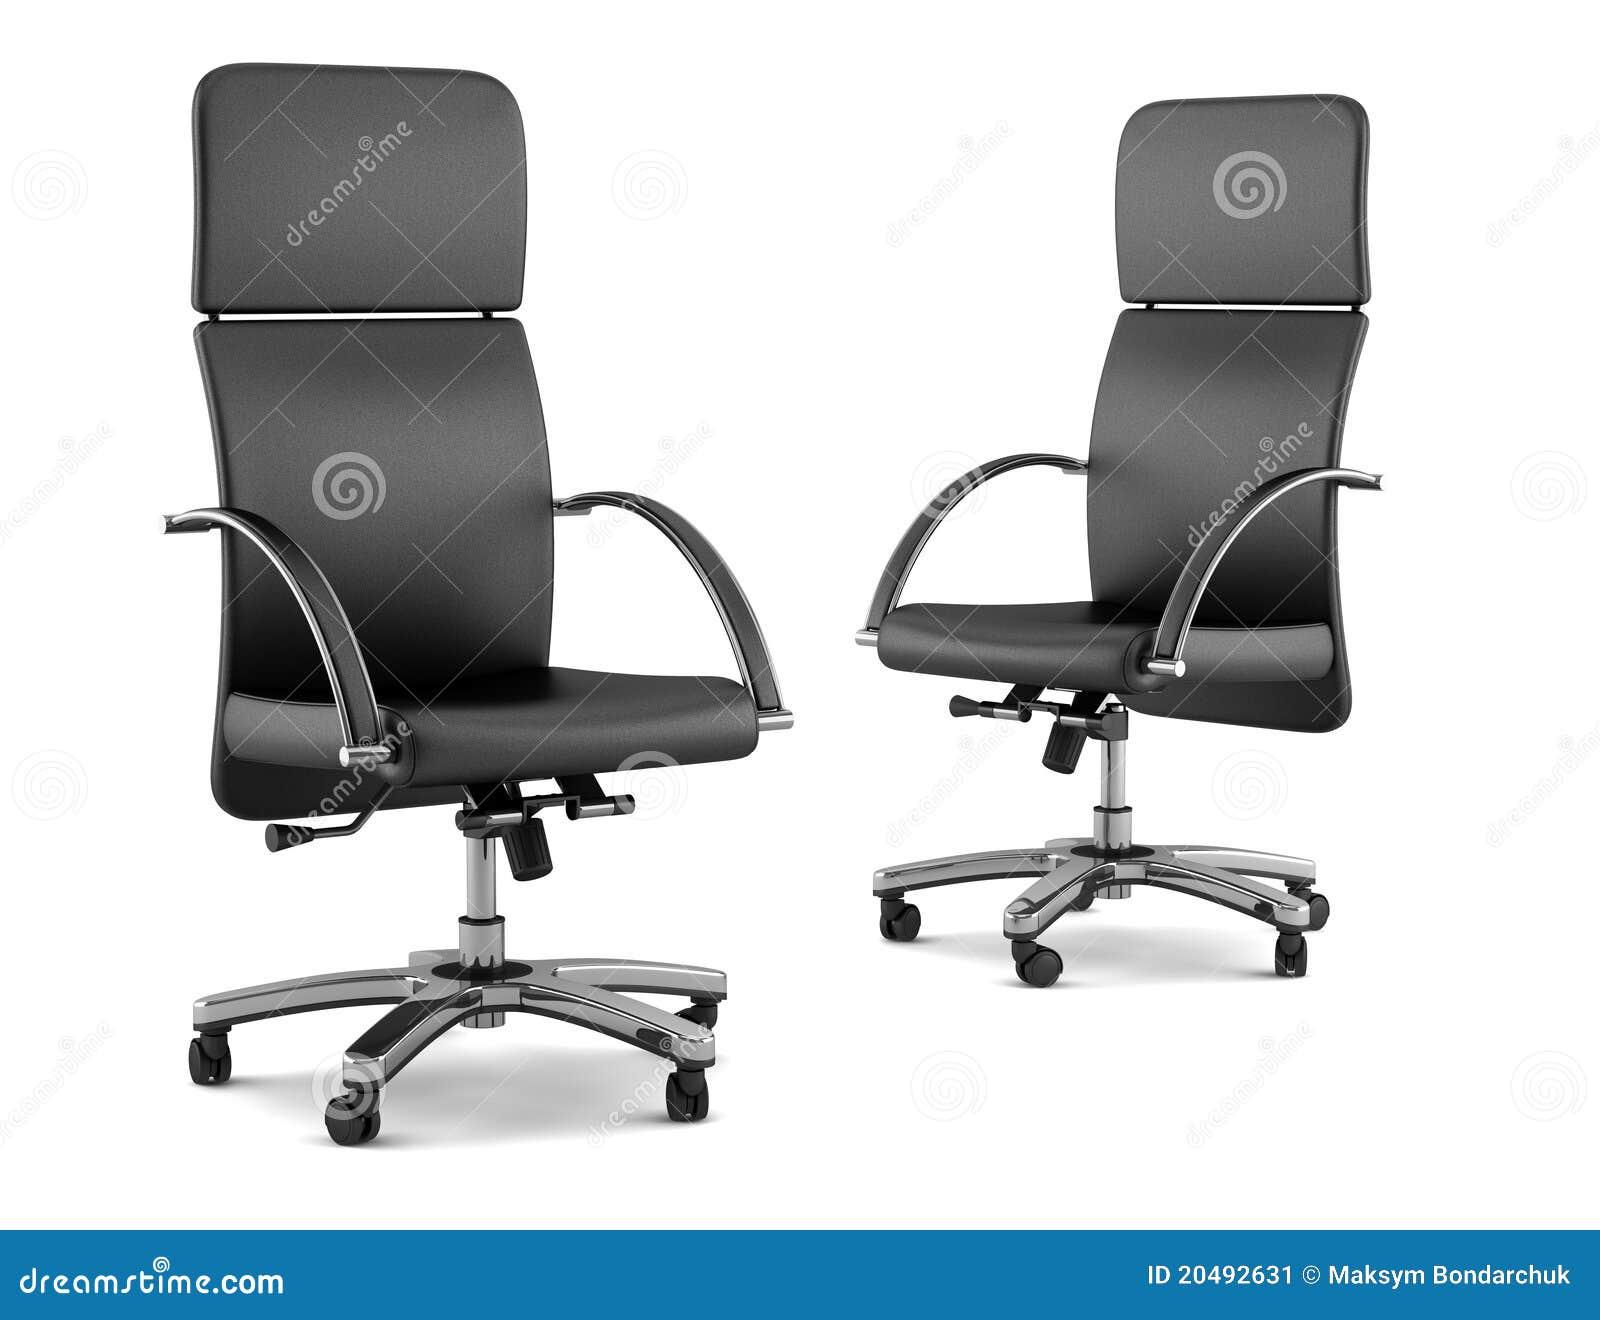 Dos sillas negras modernas de la oficina en blanco stock for Sillas de oficina modernas